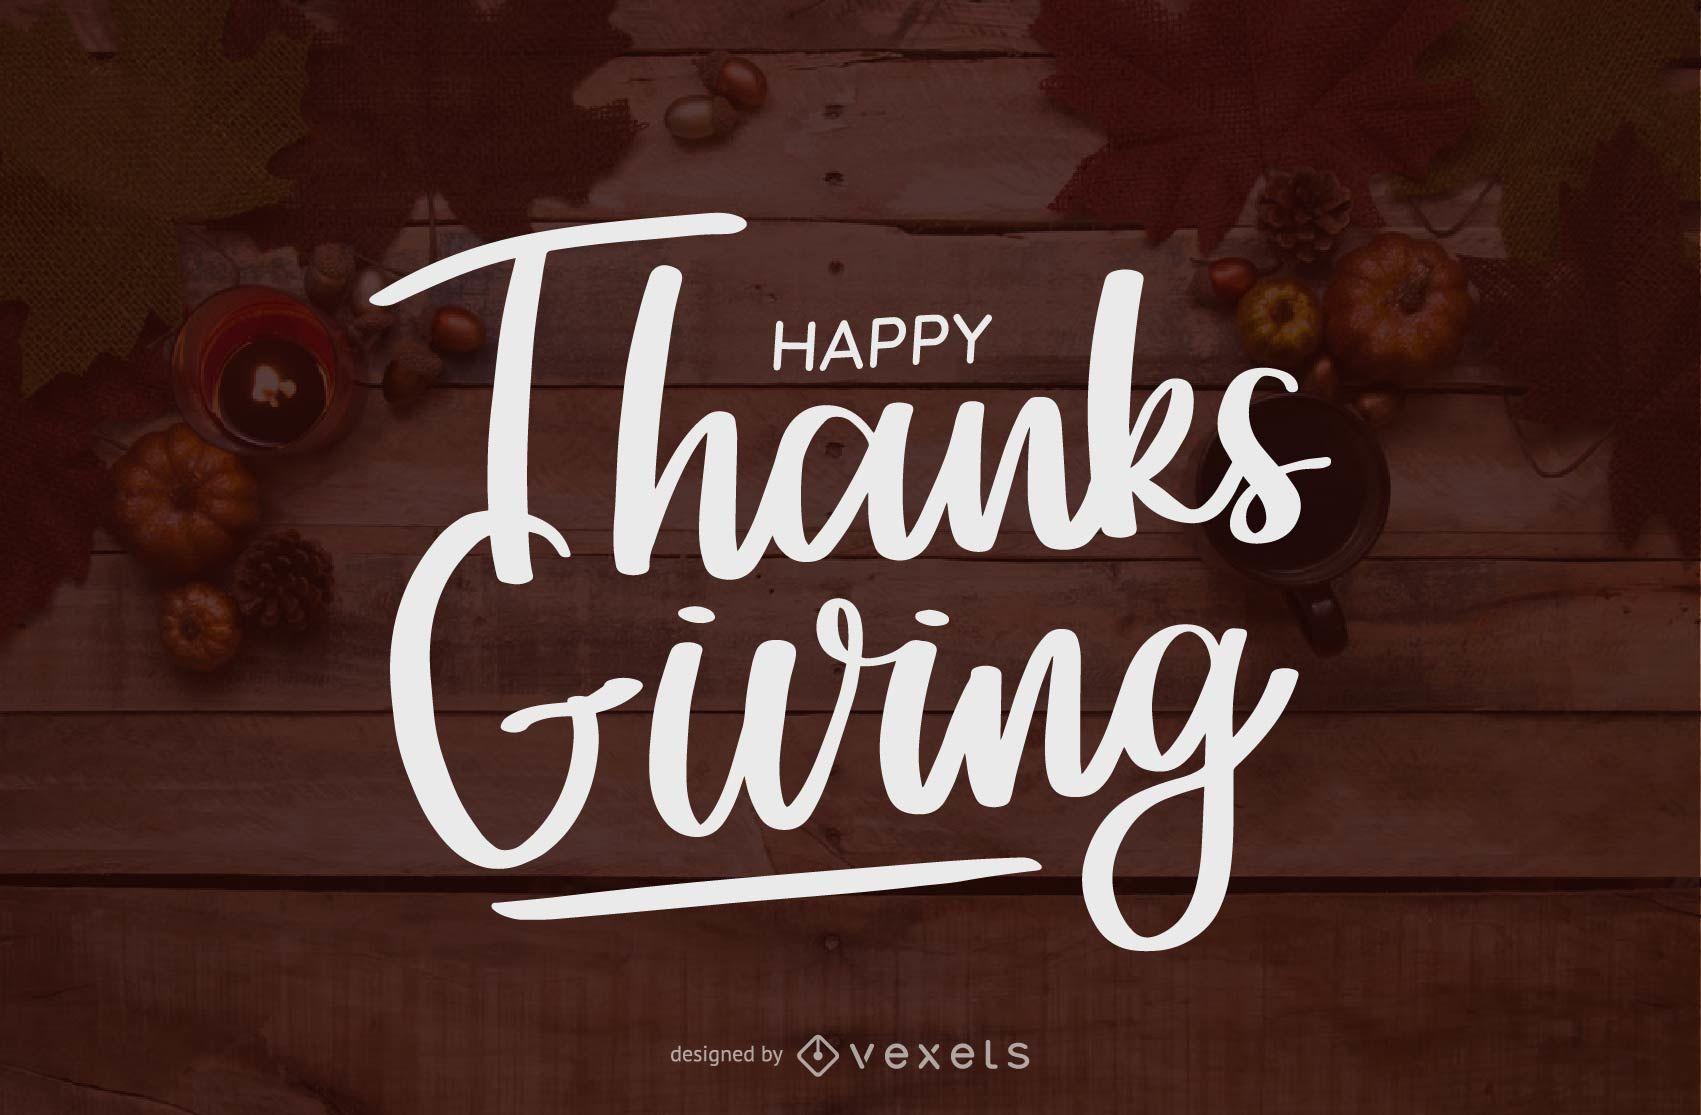 Happy Thanksgiving Handwritten Lettering